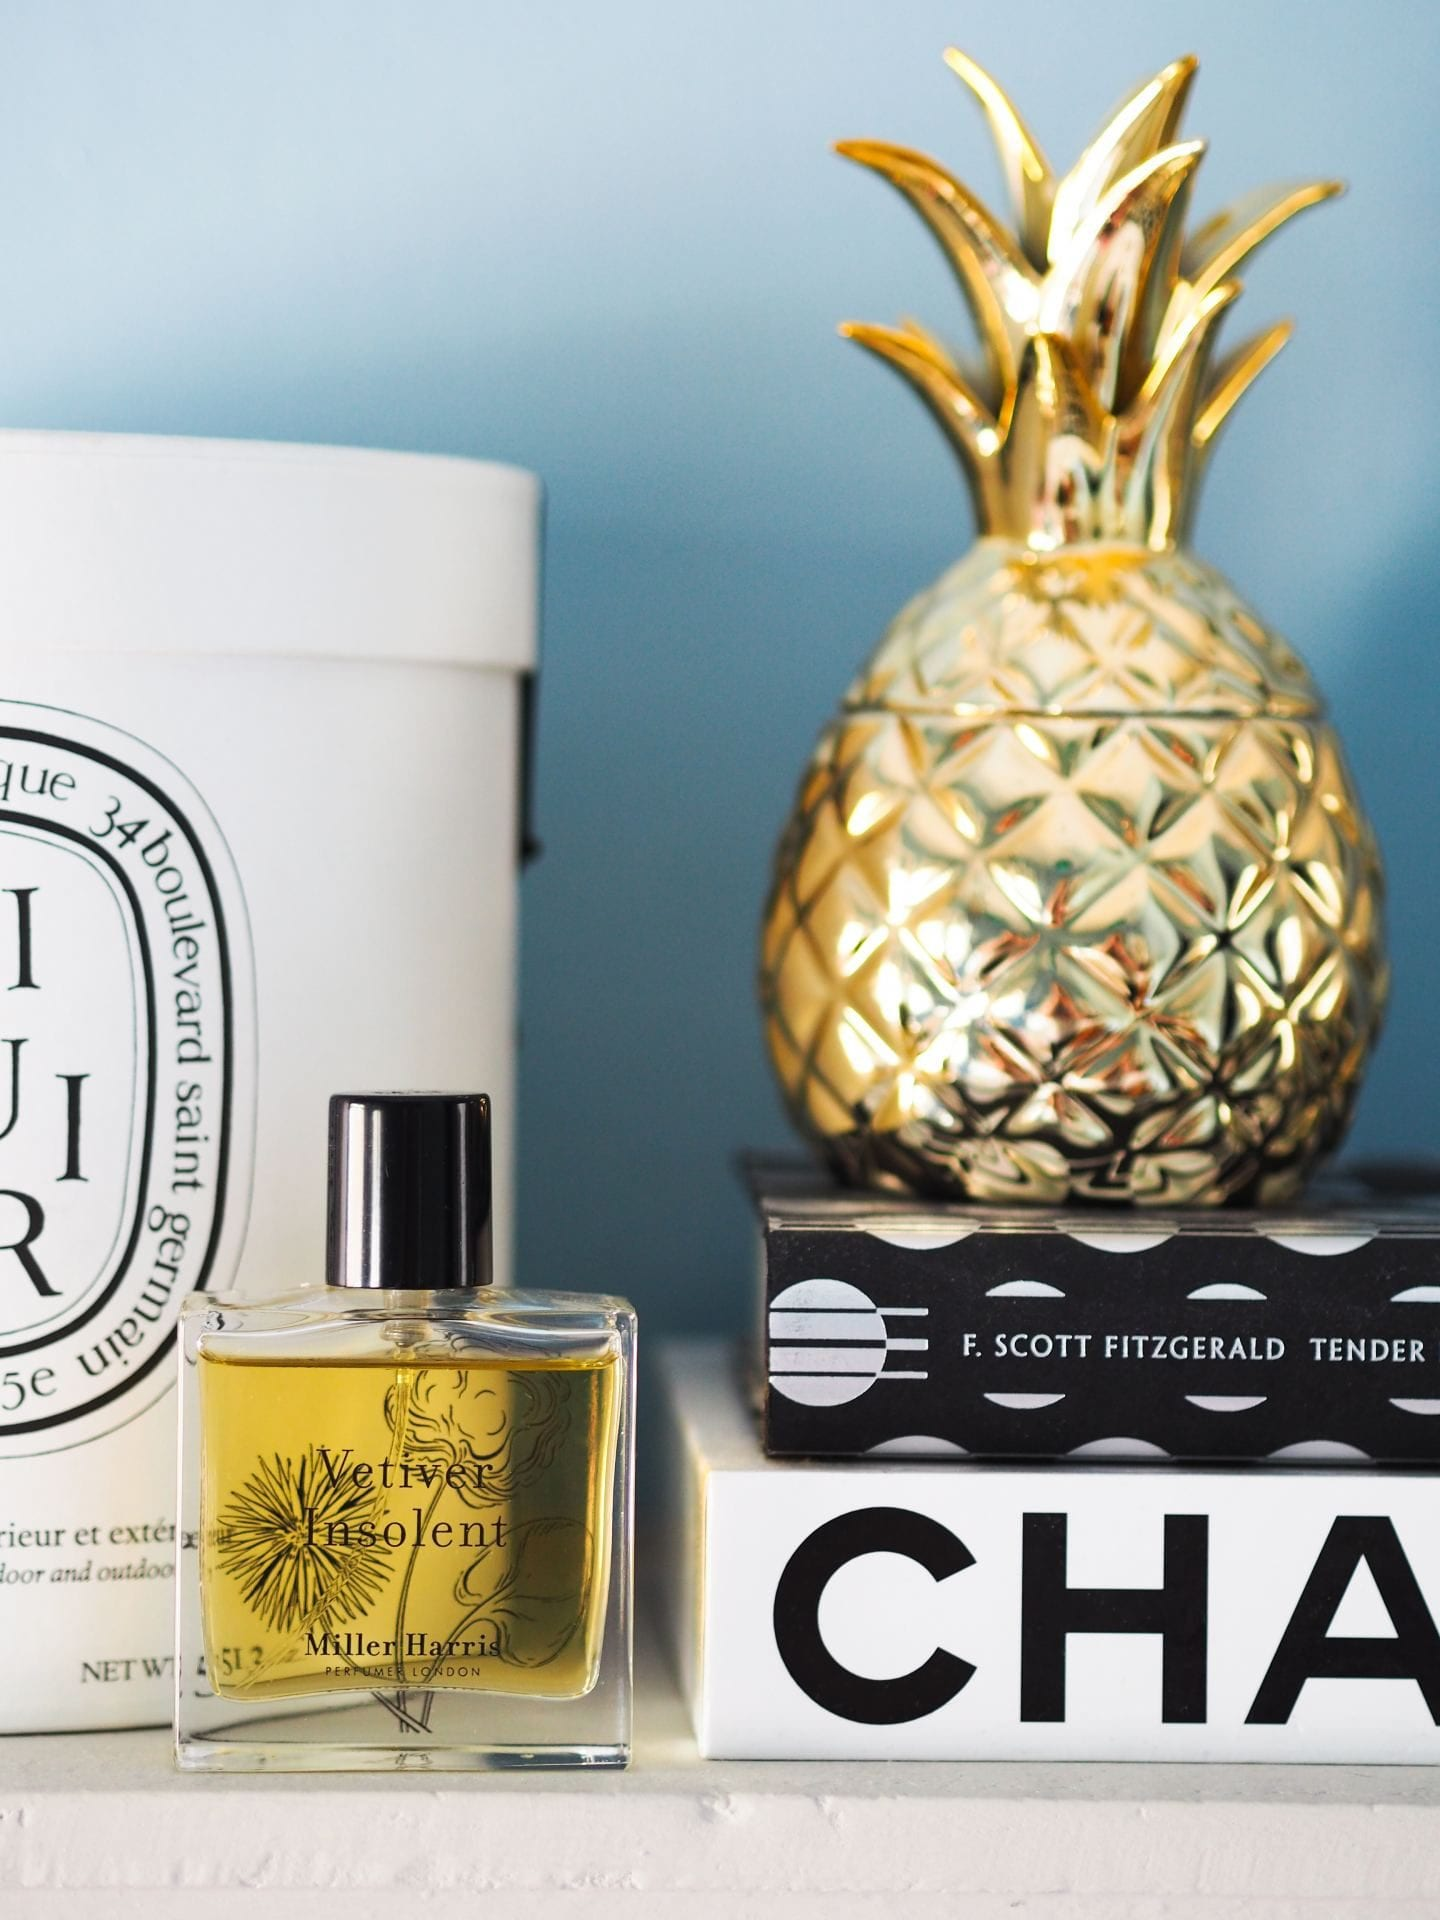 Miller Harris 'Vetiver Insolent' perfume